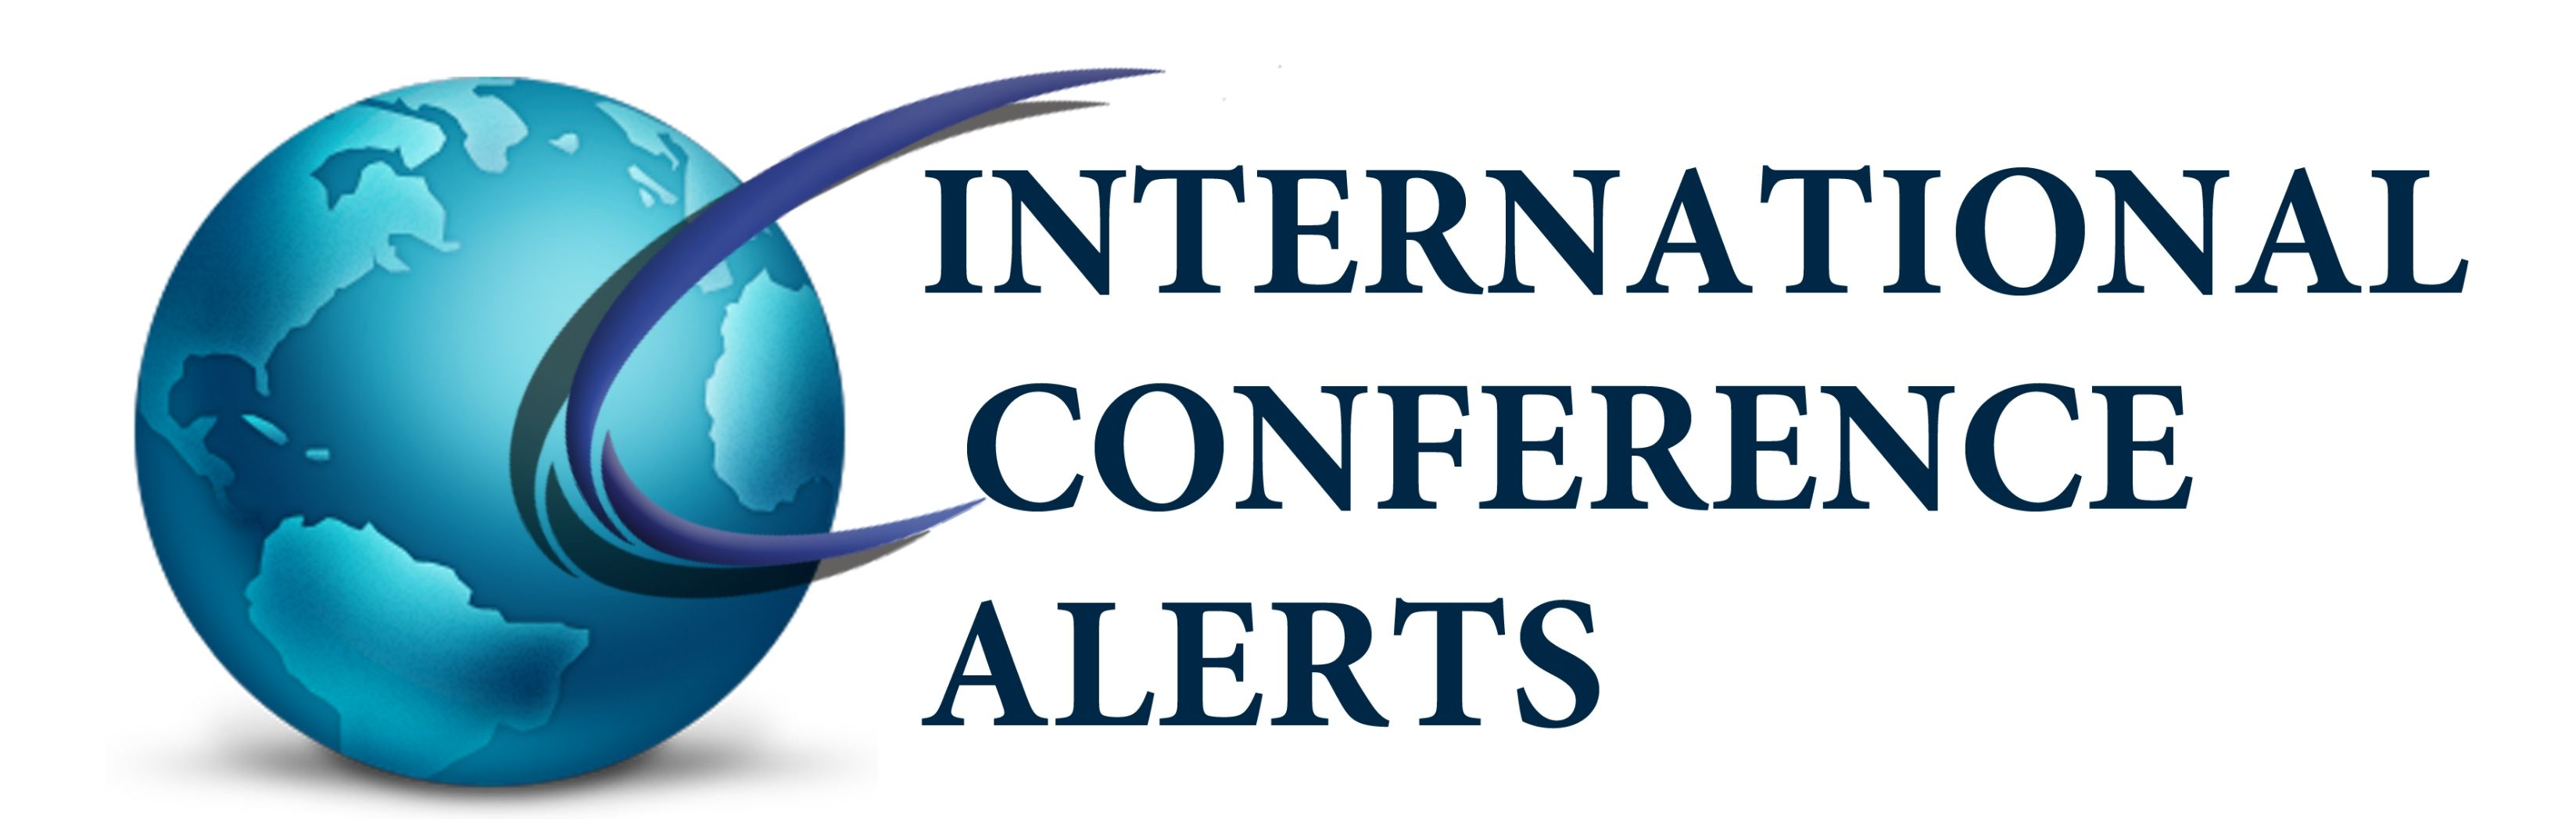 International Conference Alerts